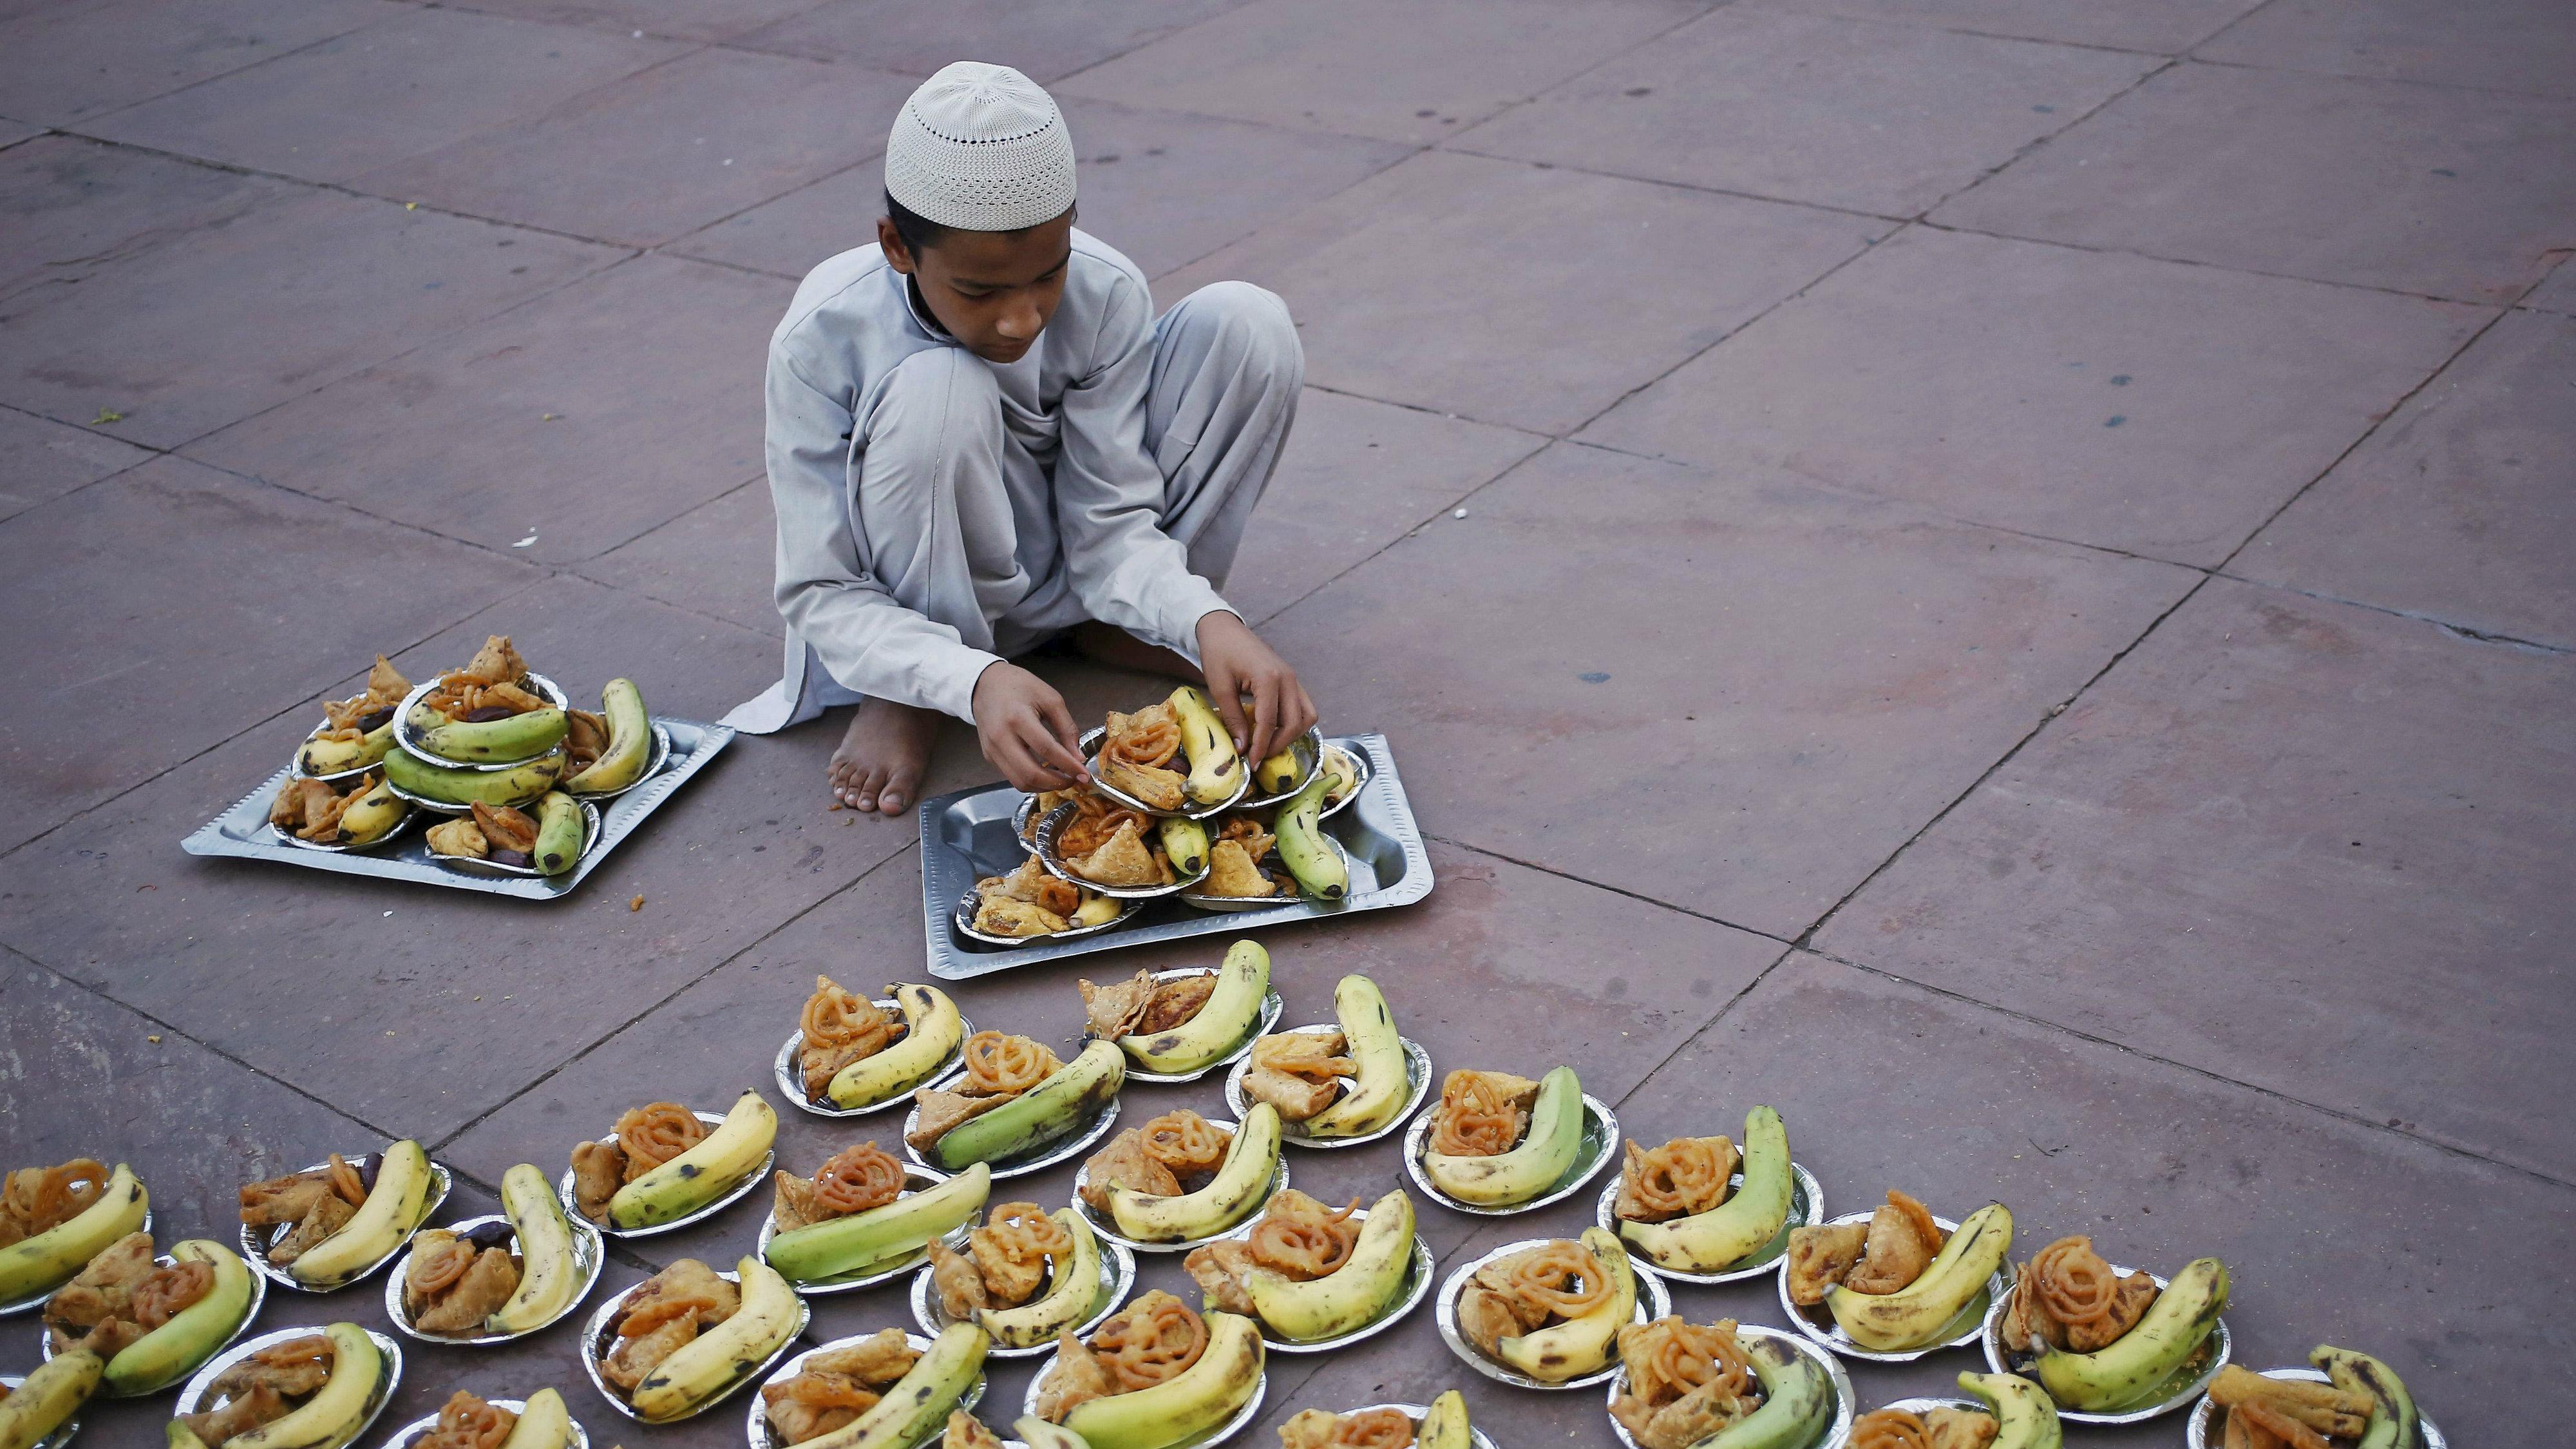 Squatting to prepare Iftar